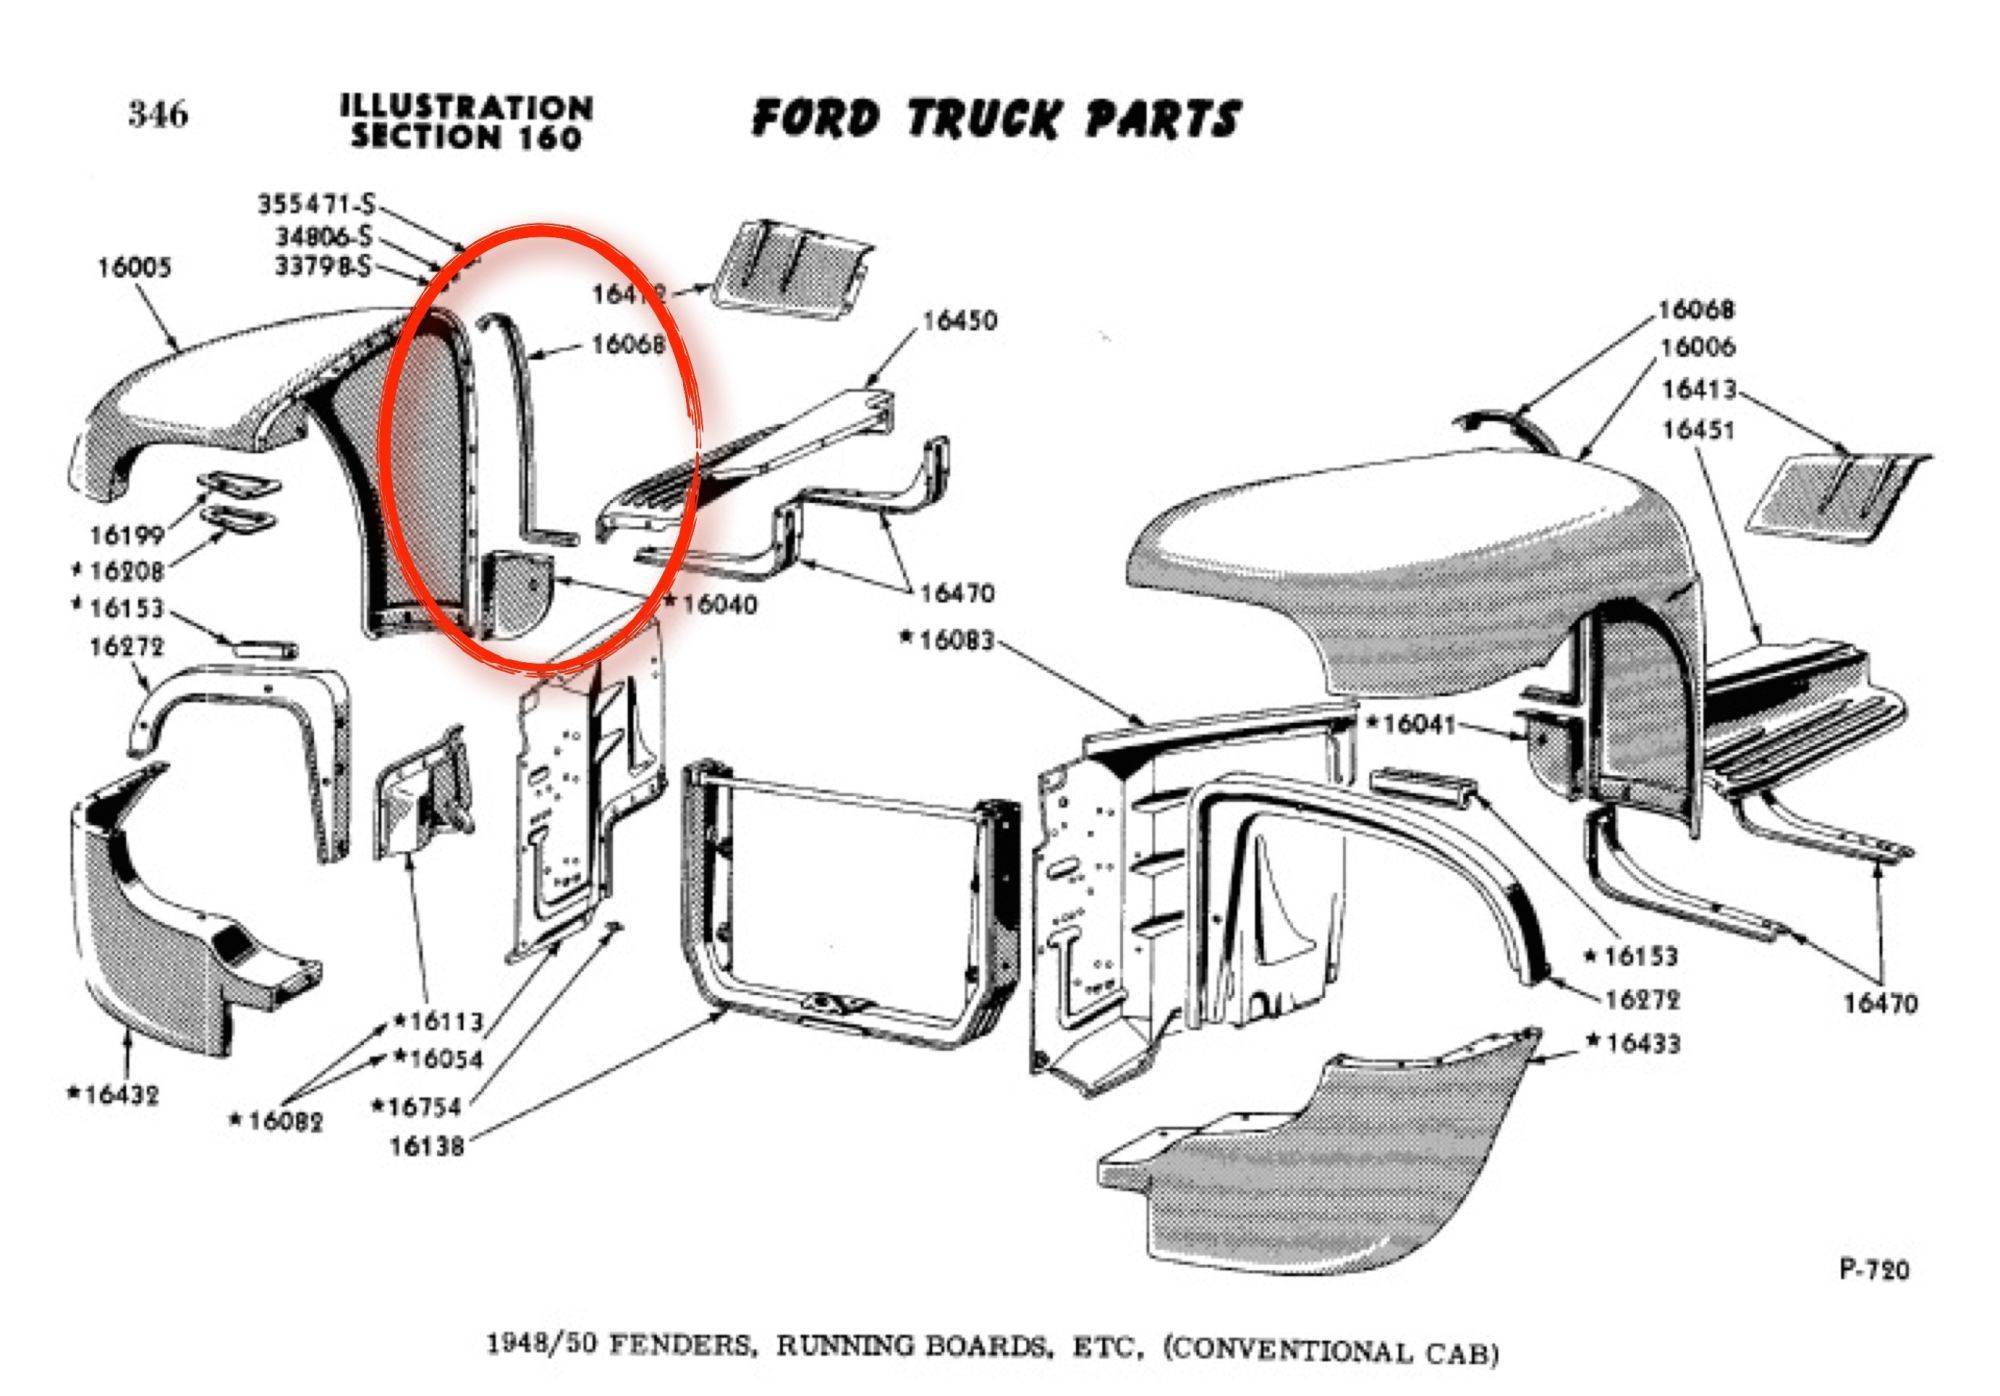 1941 ford truck interior